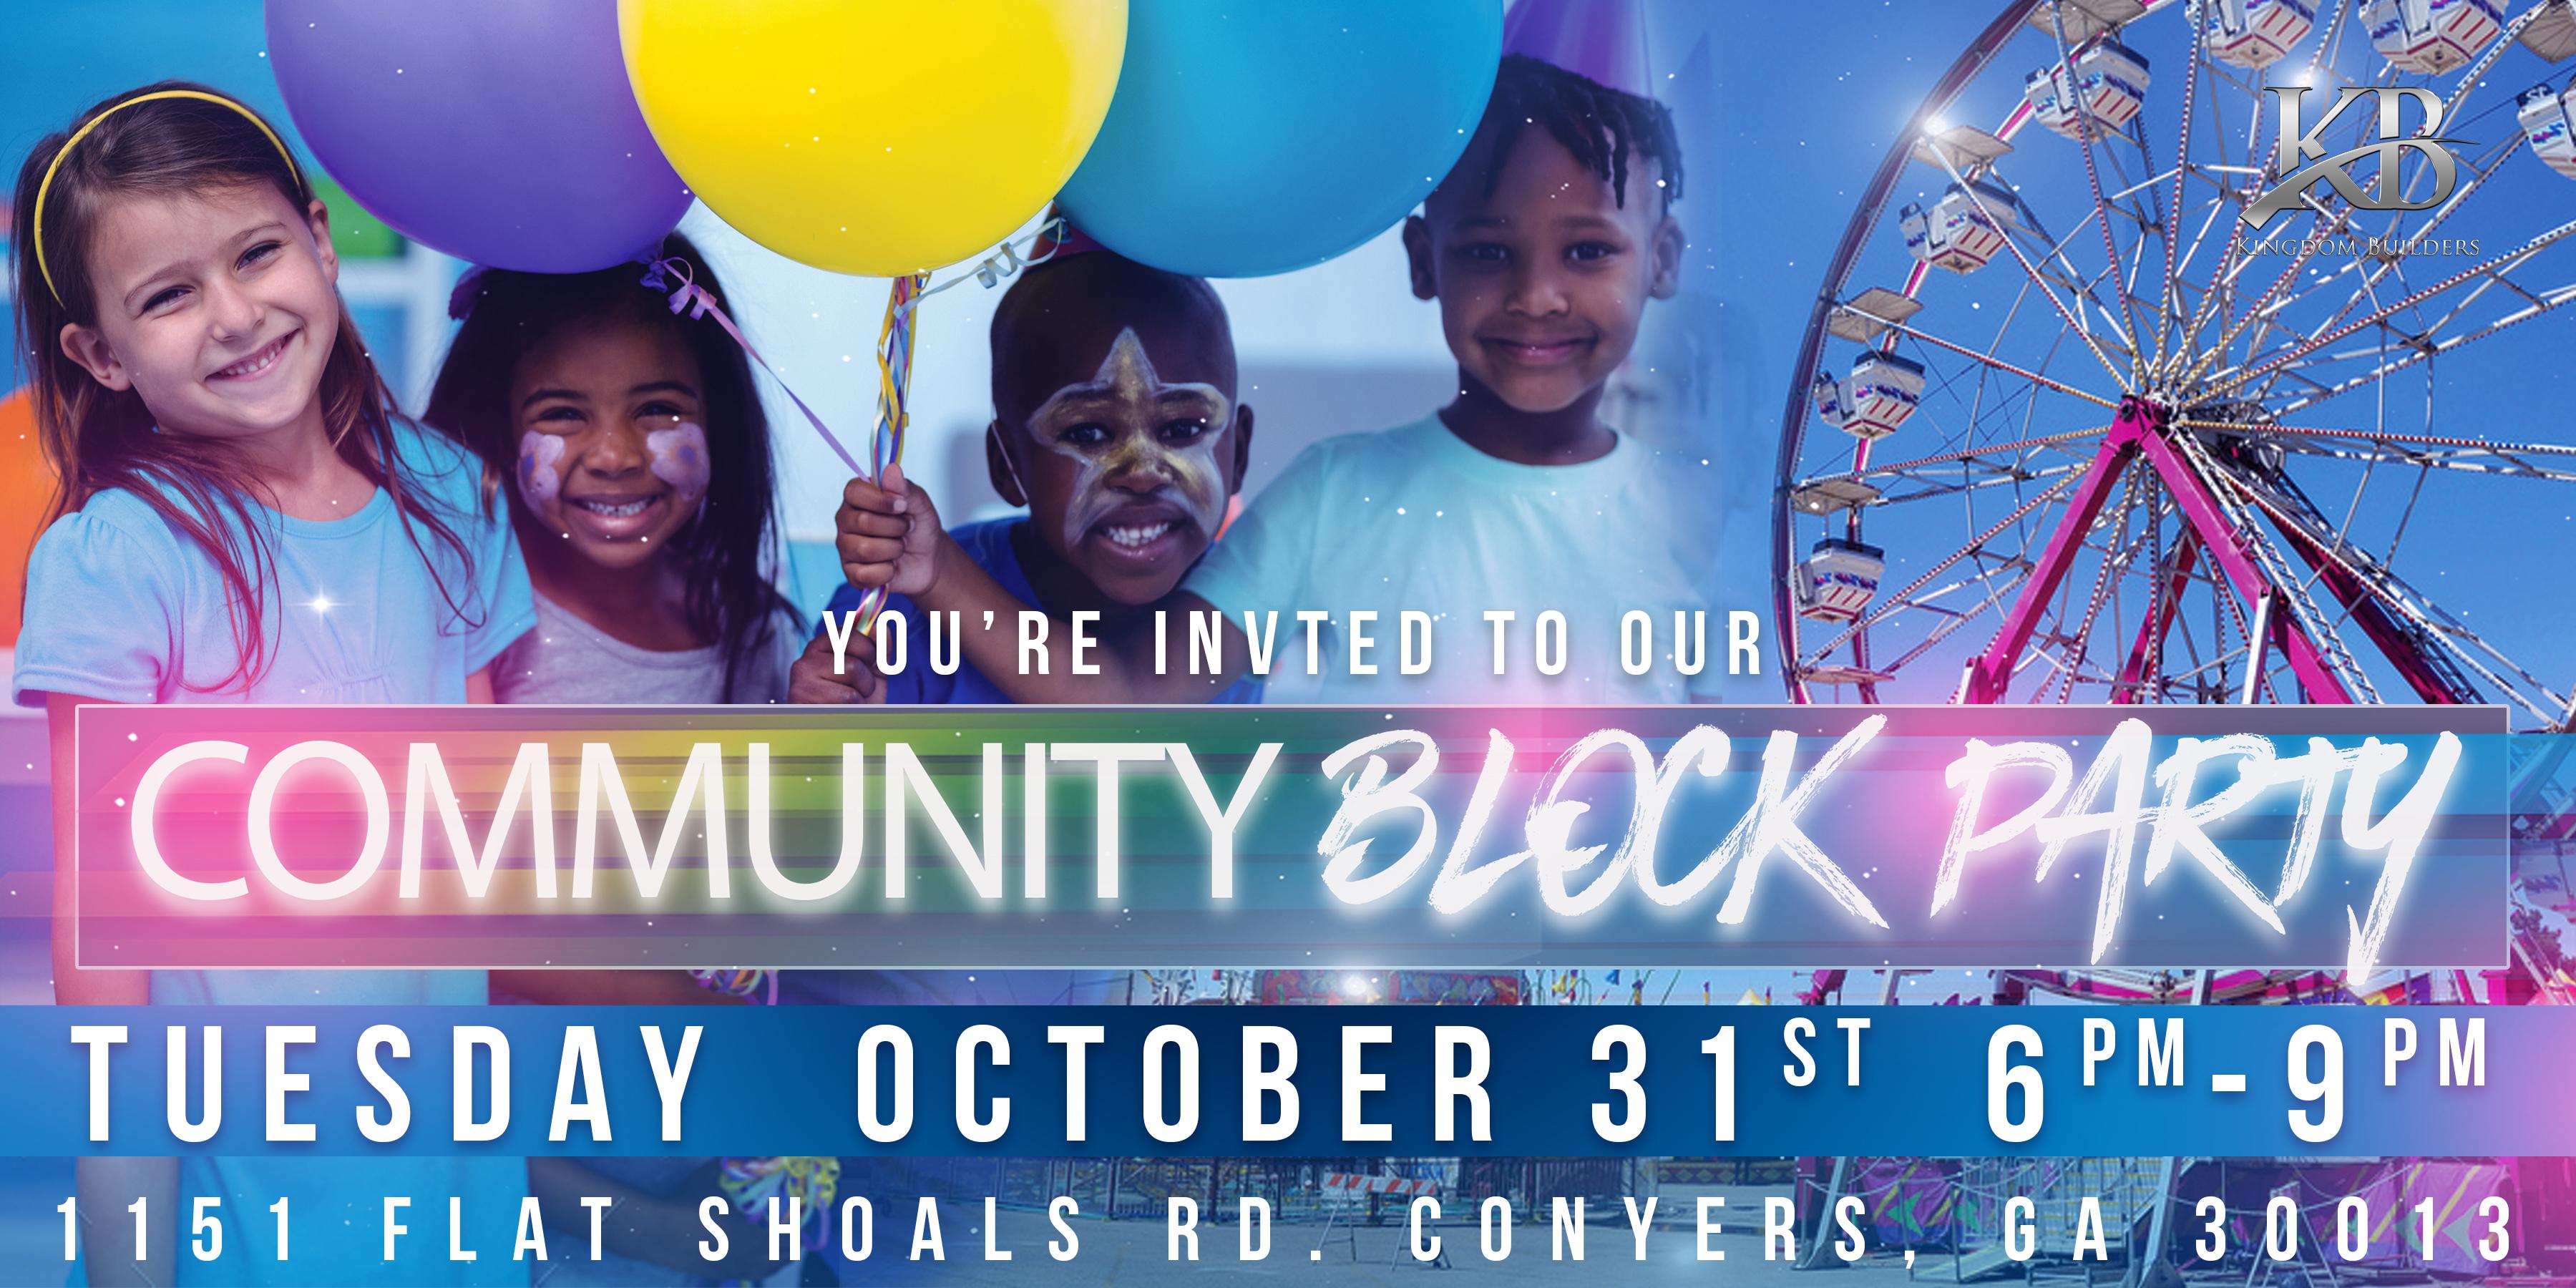 Community Block Party KB